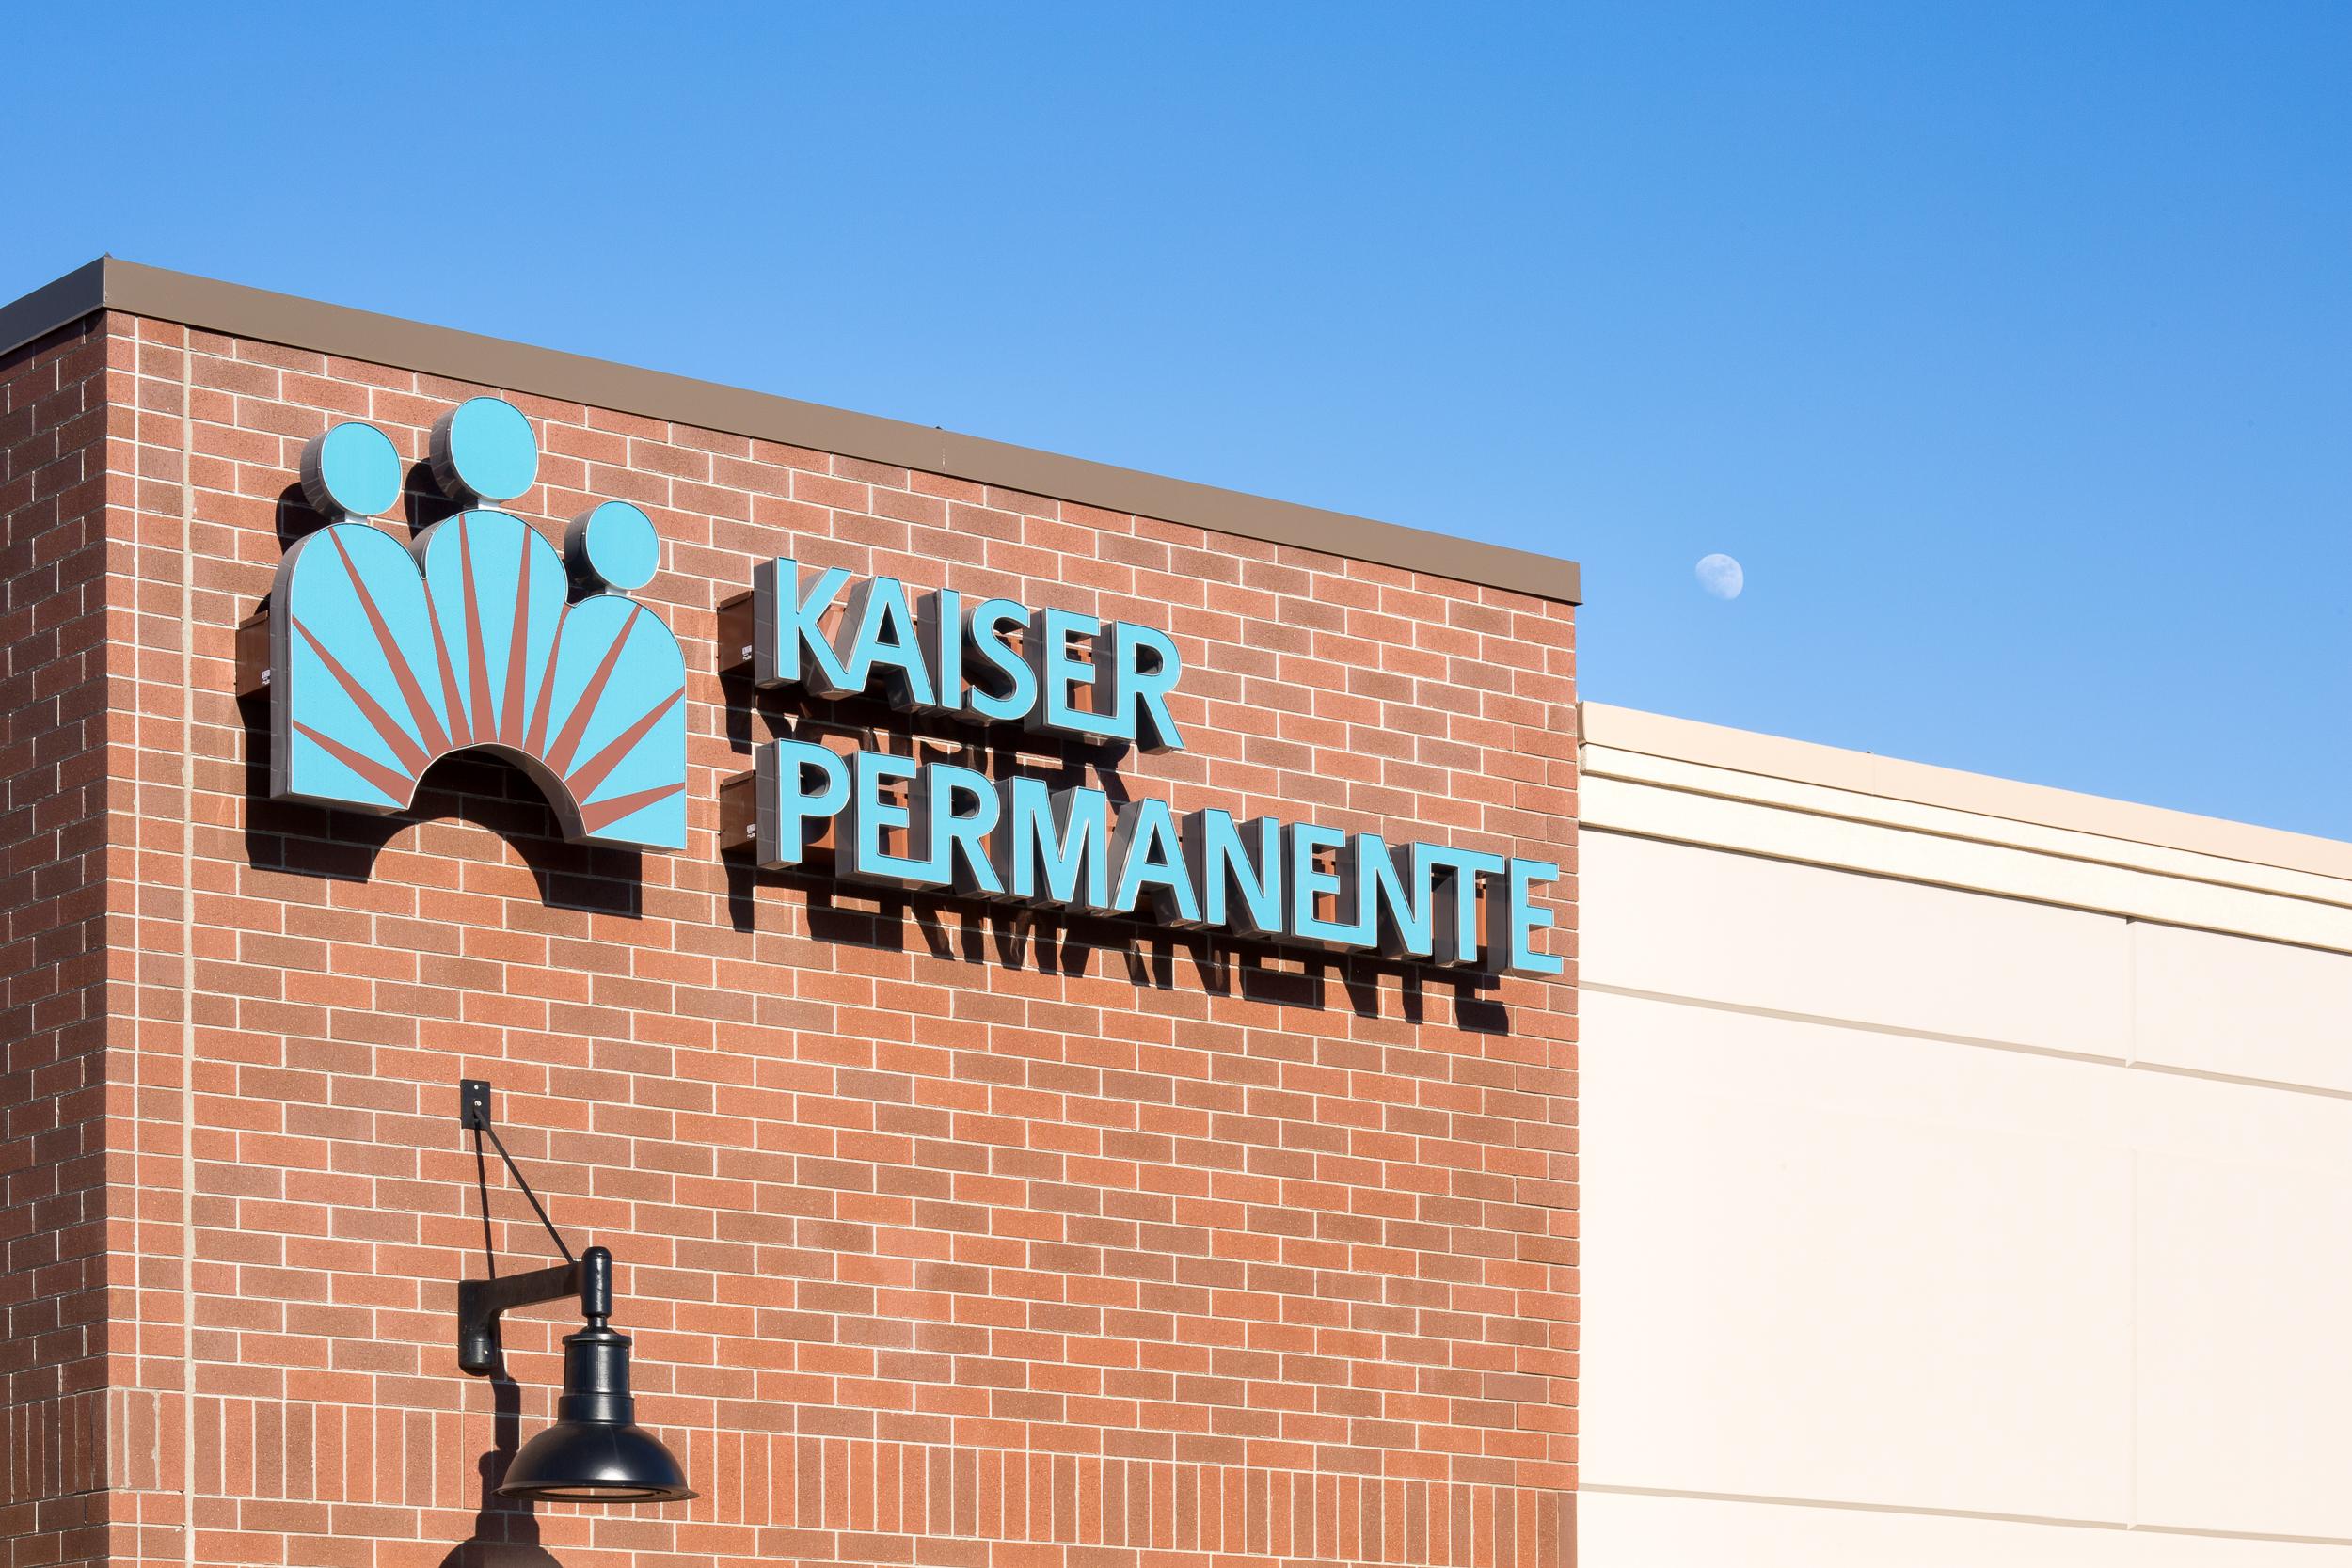 16-KaiserPerm-JoshPartee-7540-corner-signage.jpg